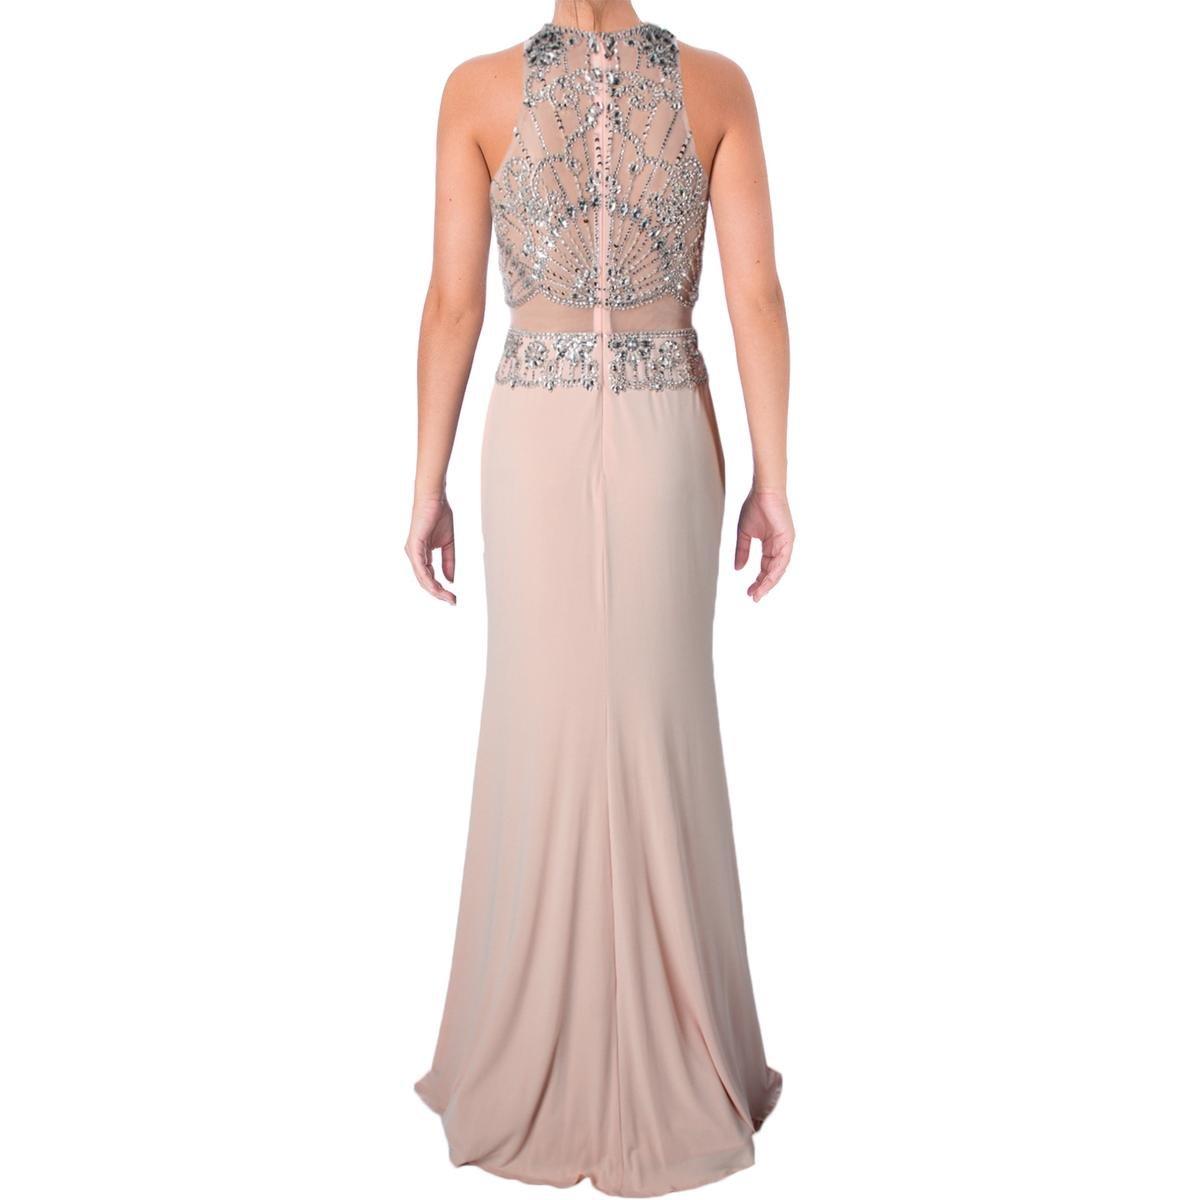 JVN by Jovani Womens Rhinestone Beaded Formal Dress - Beige -: Amazon.co.uk: Clothing